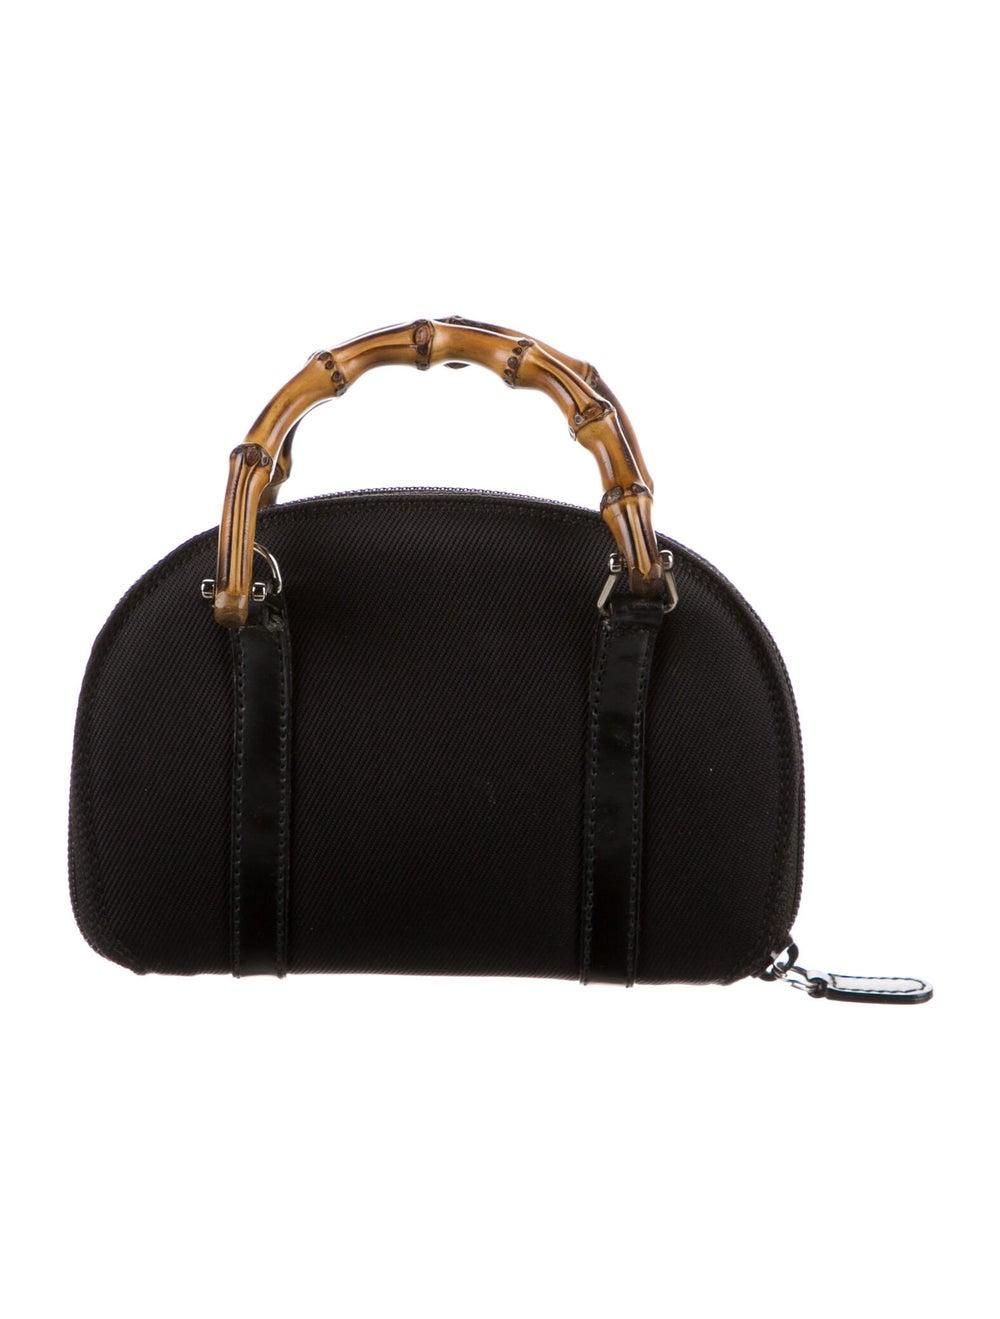 Gucci Vintage Mini Bamboo Handle Bag Black - image 4